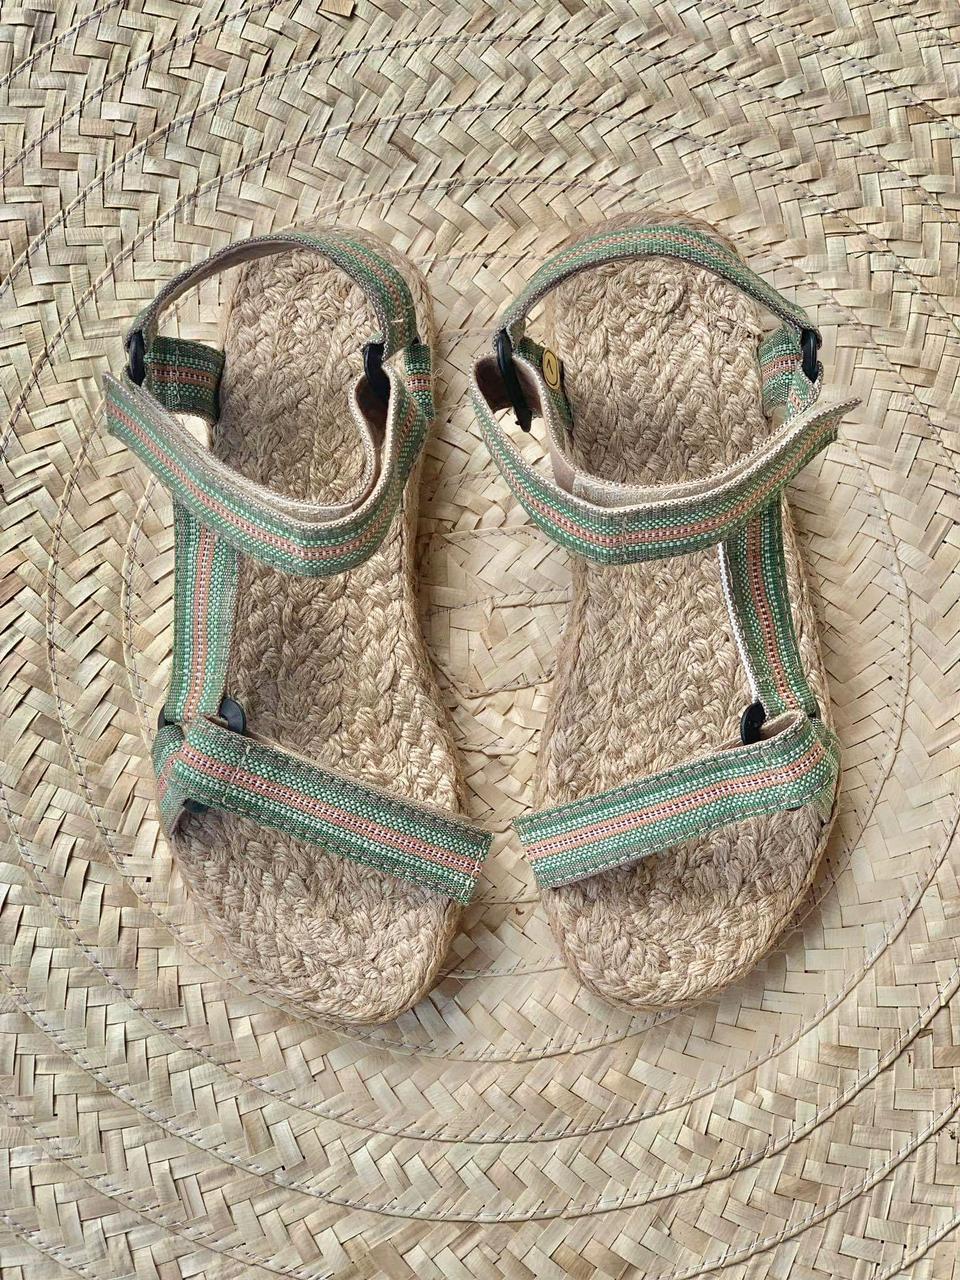 Nomad sandals made using Kalinga fabrics and abaca by CAMLU